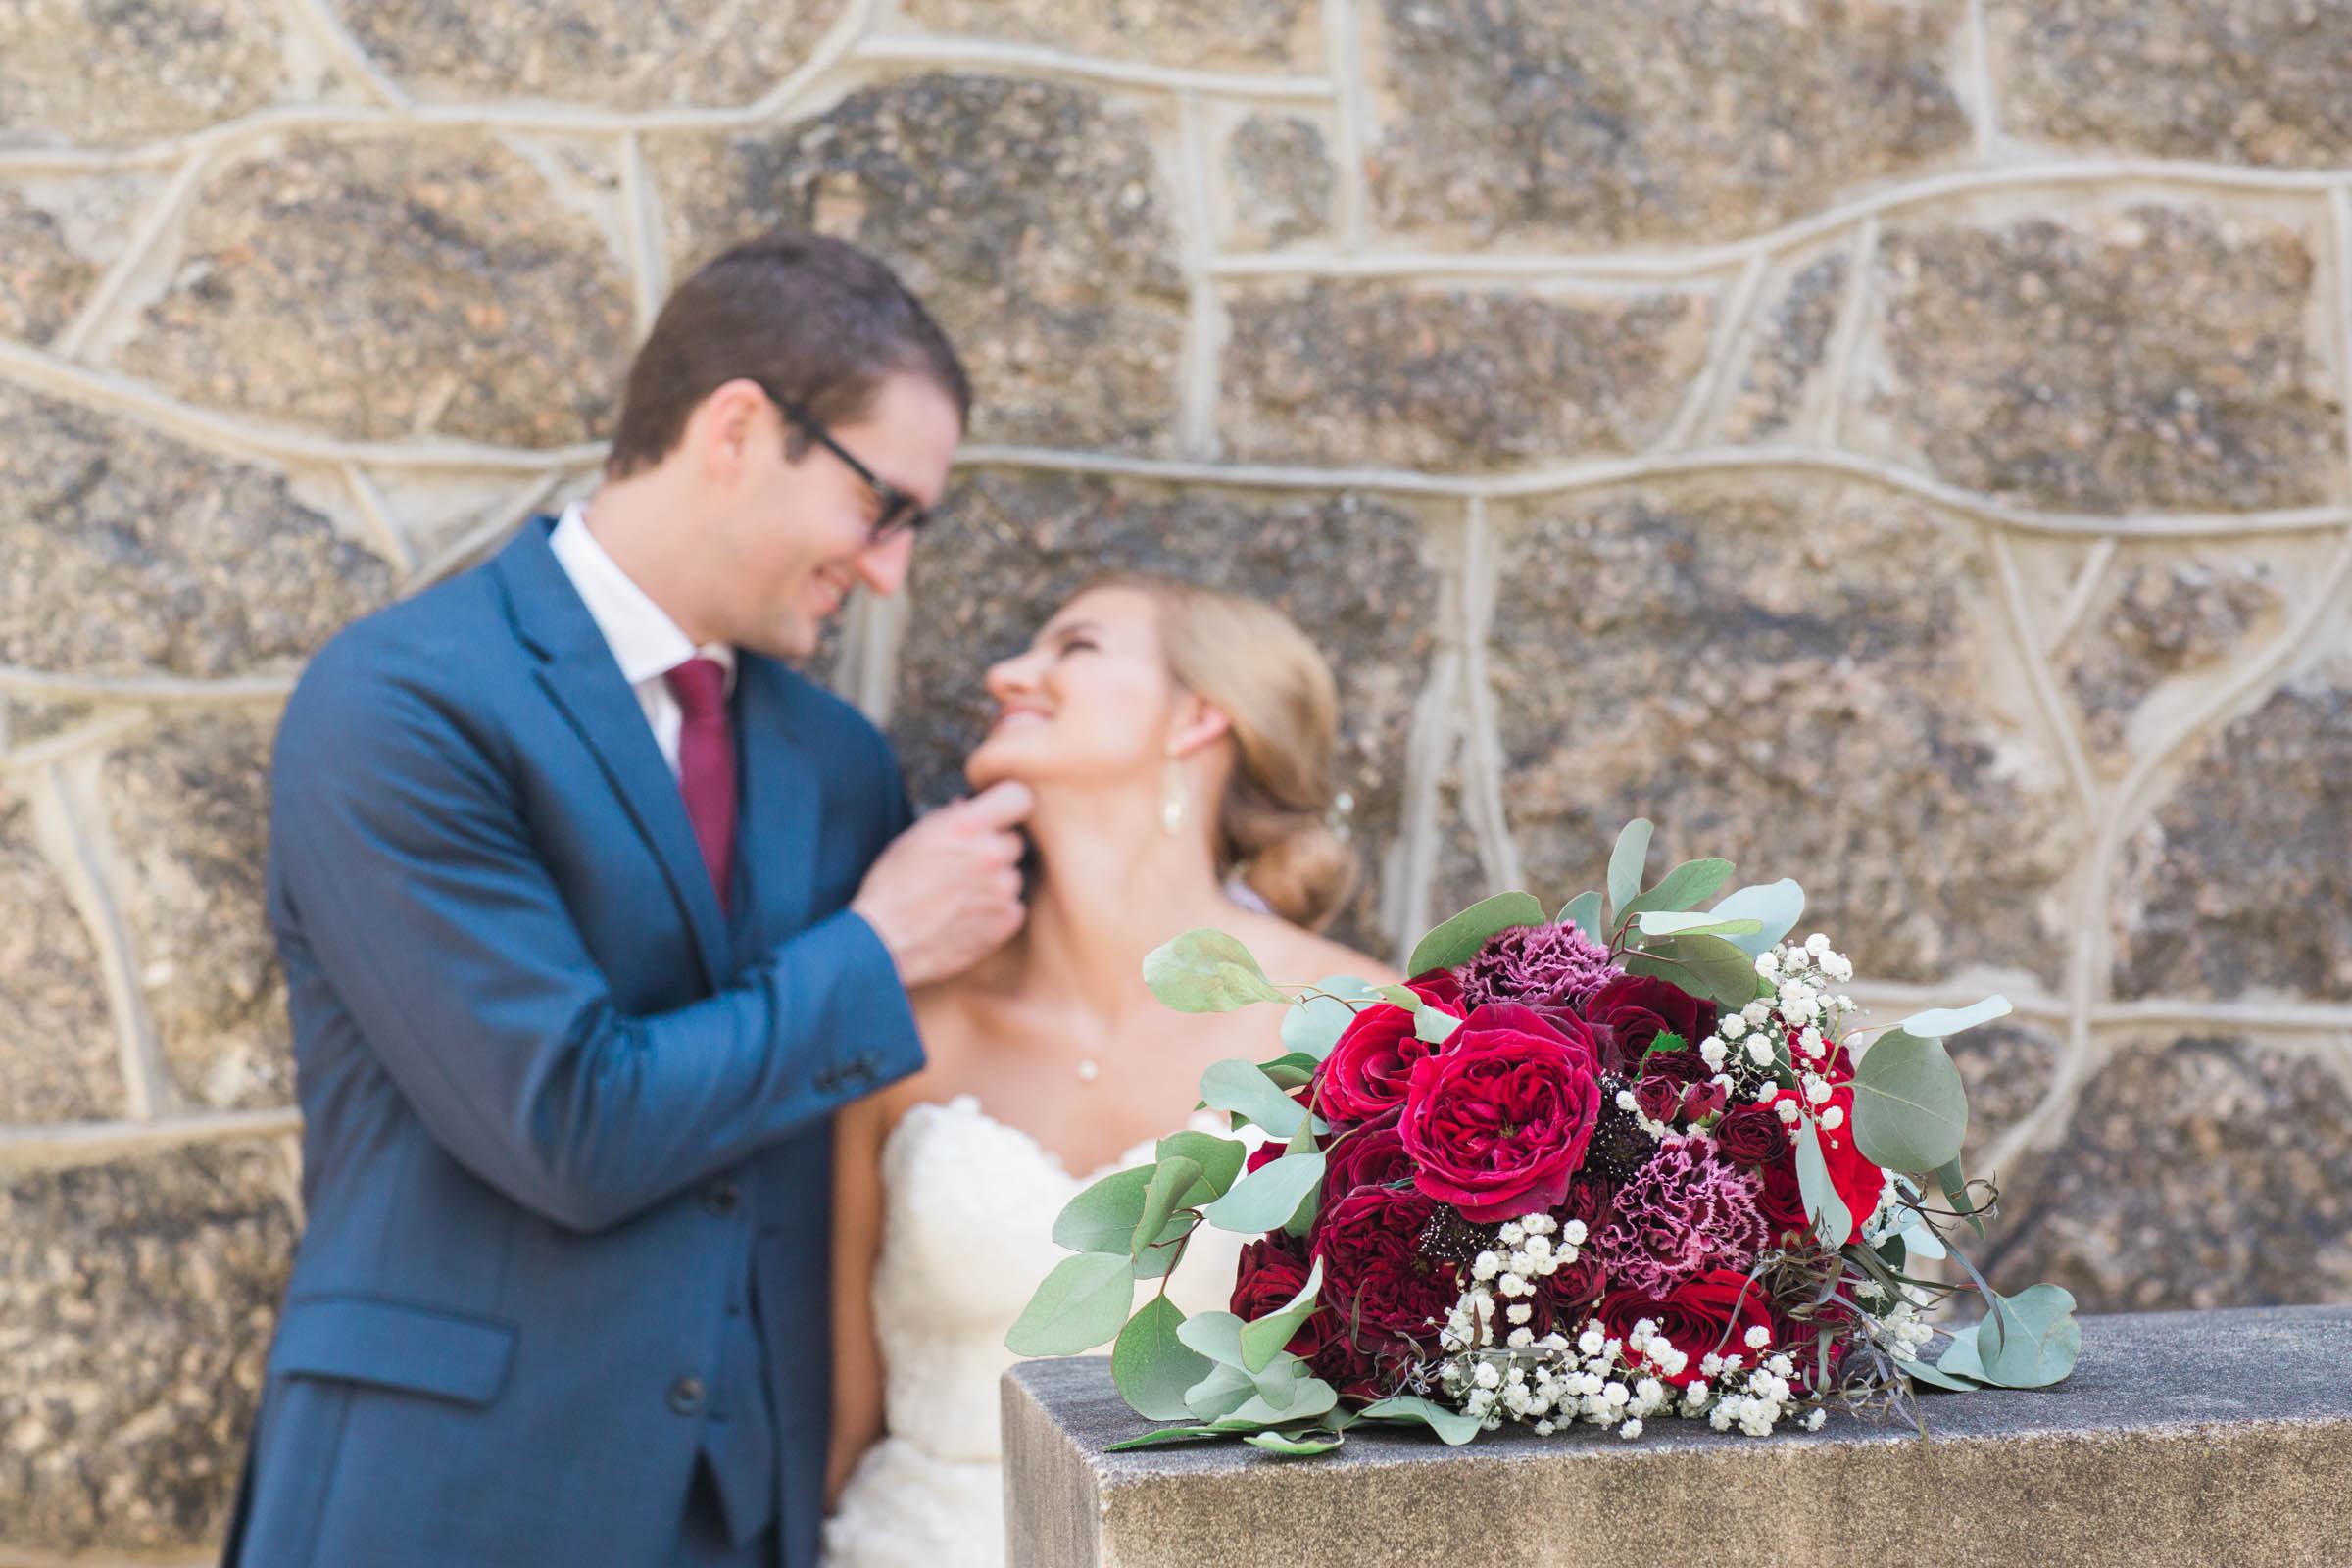 Best Wedding Photographers in Baltimore Maryland Megapixels Media PHOTOGRAPHY (6 of 25).jpg